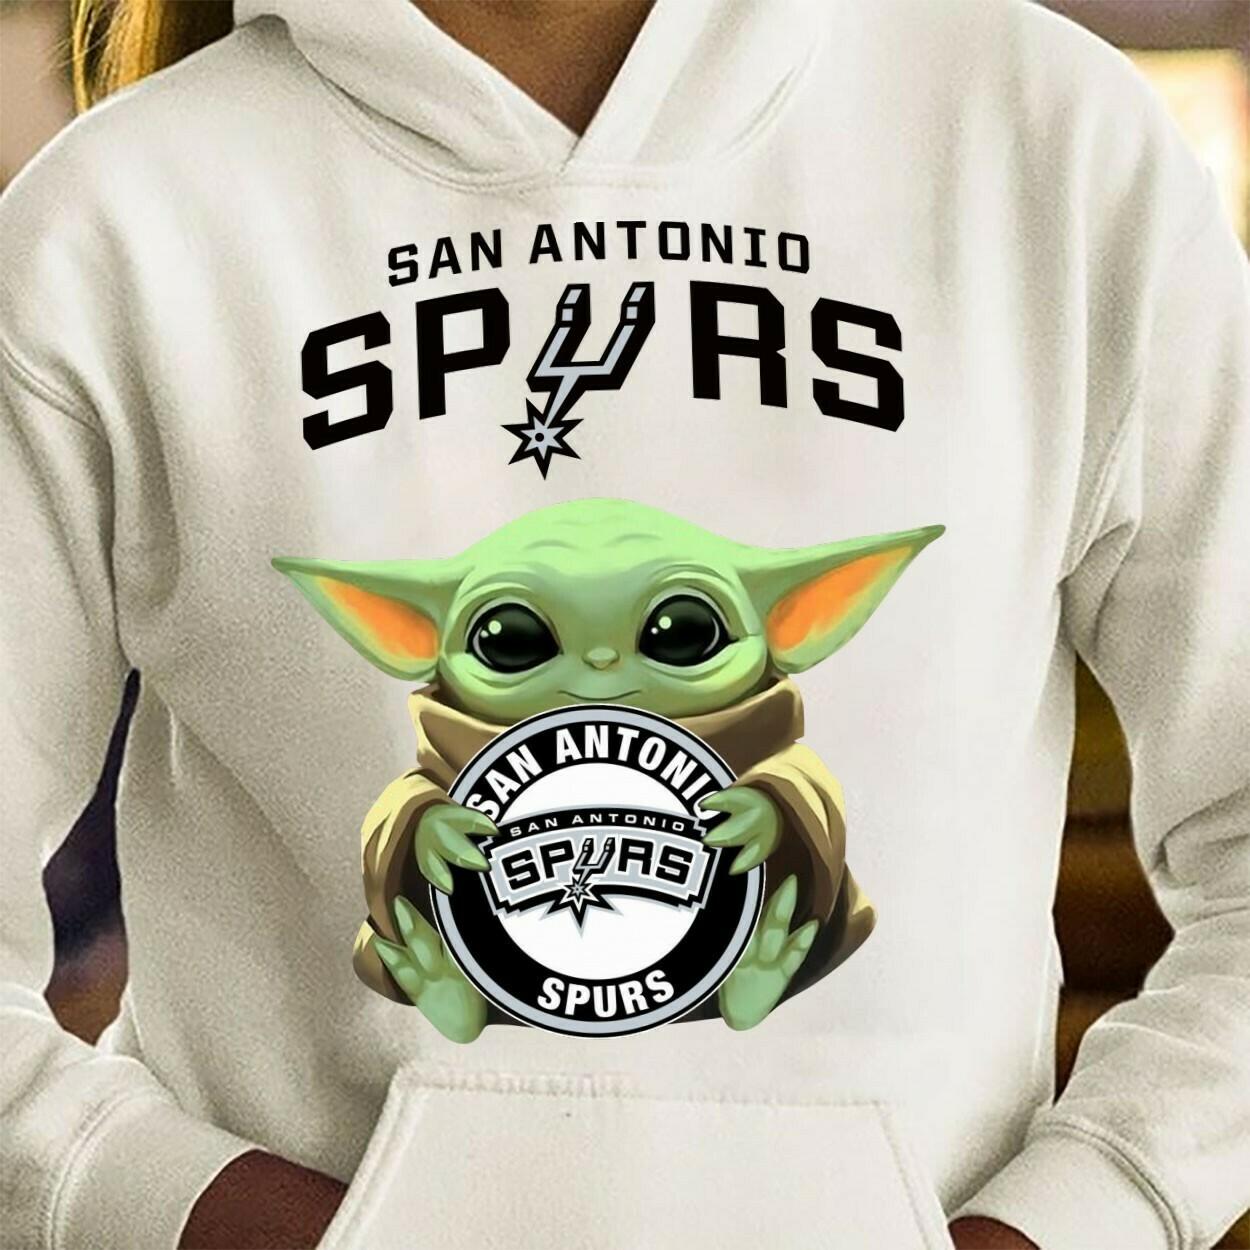 Aan Antonio Spurs Baby Yoda Star Wars The Mandalorian The Child First Memories Floating NBA Basketball Dad Mon Kid Fan Gift T-Shirt Long Sleeve Sweatshirt Hoodie Jolly Family Gifts